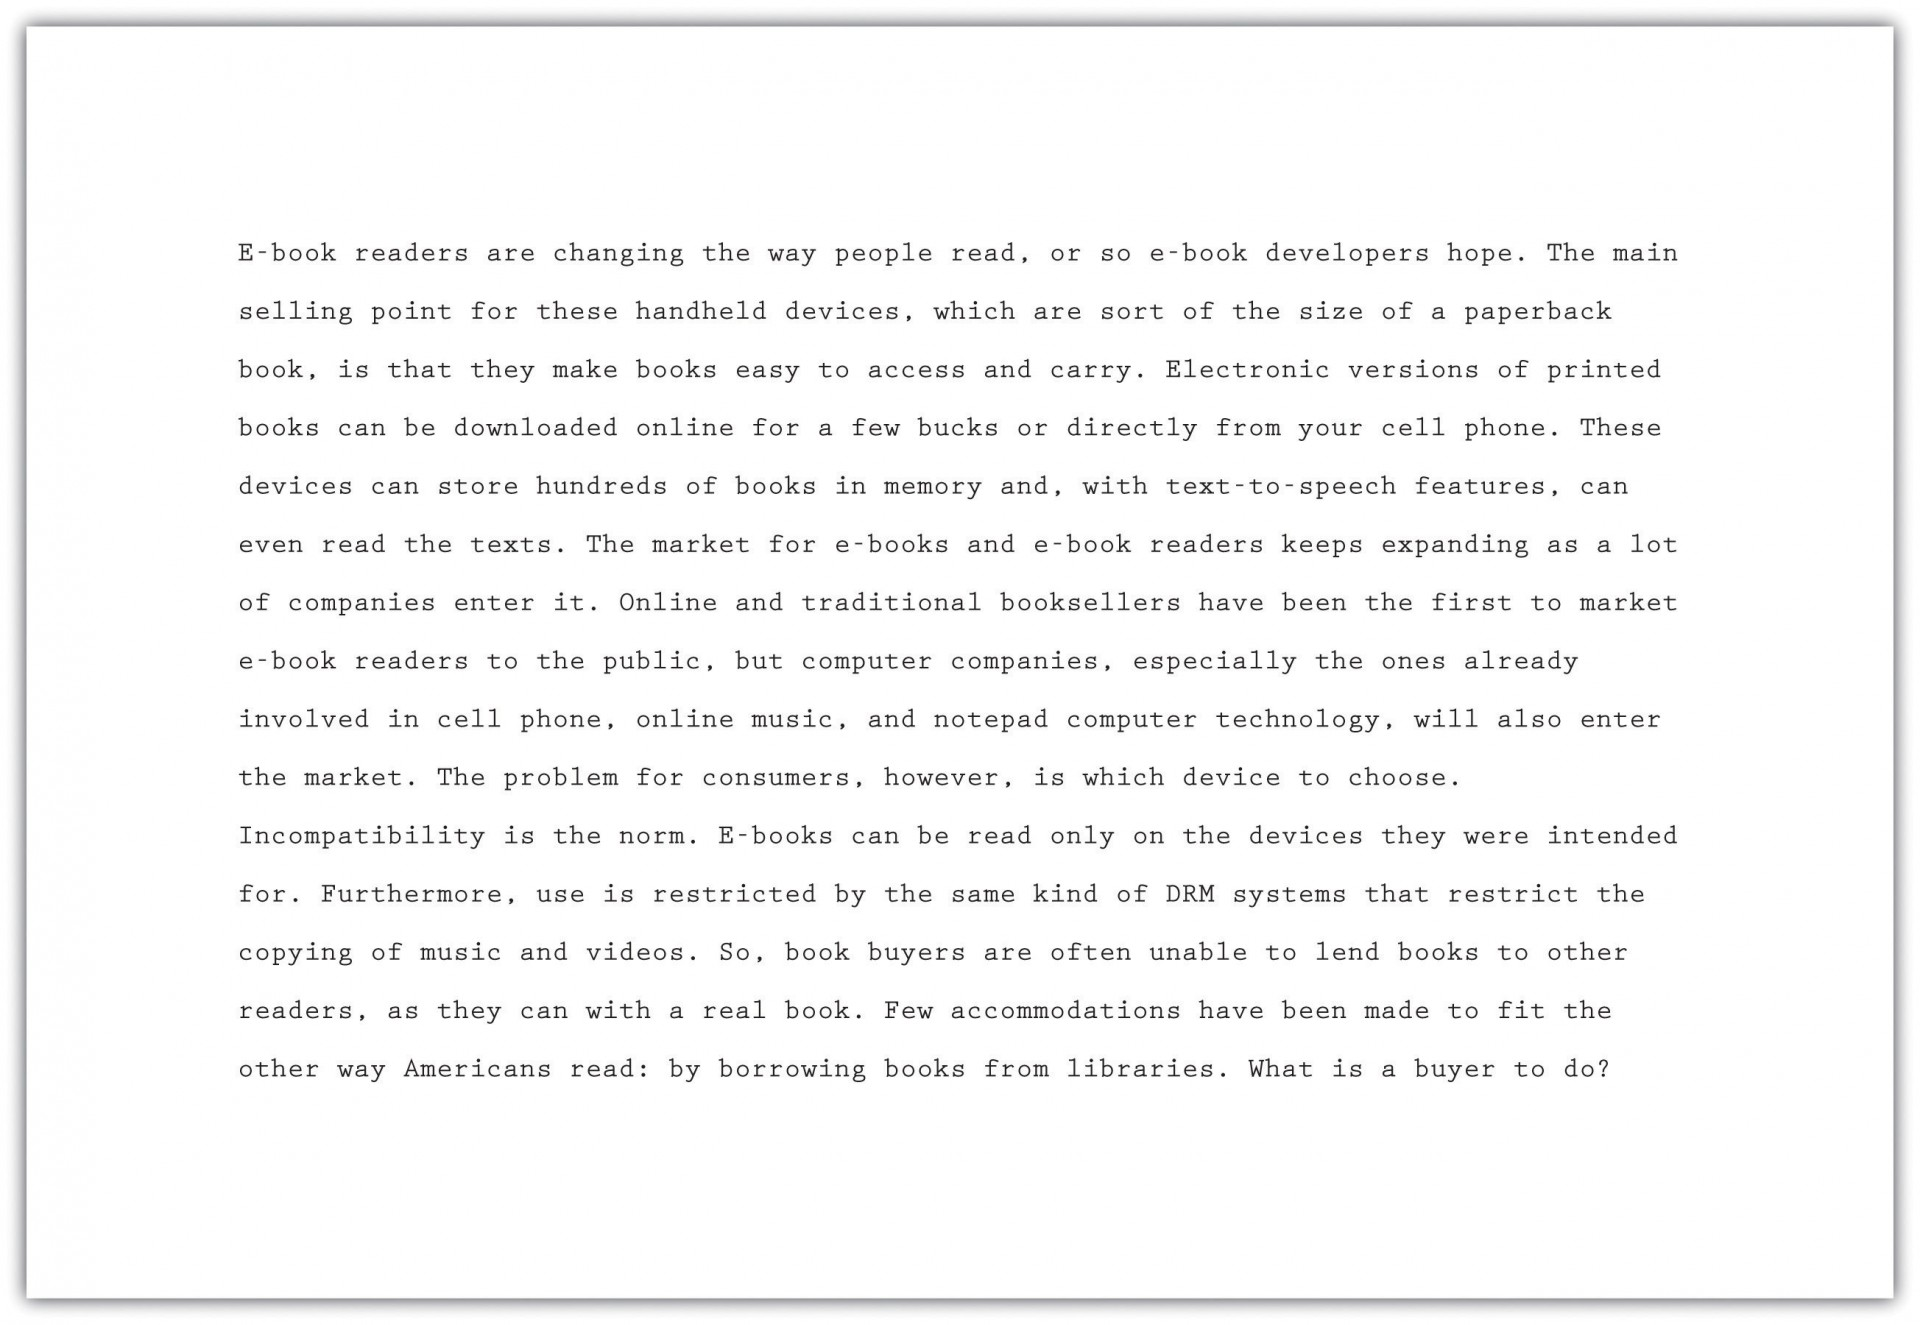 011 Essay Example Good Persuasive Amazing Topics For College Argumentative High School 1920